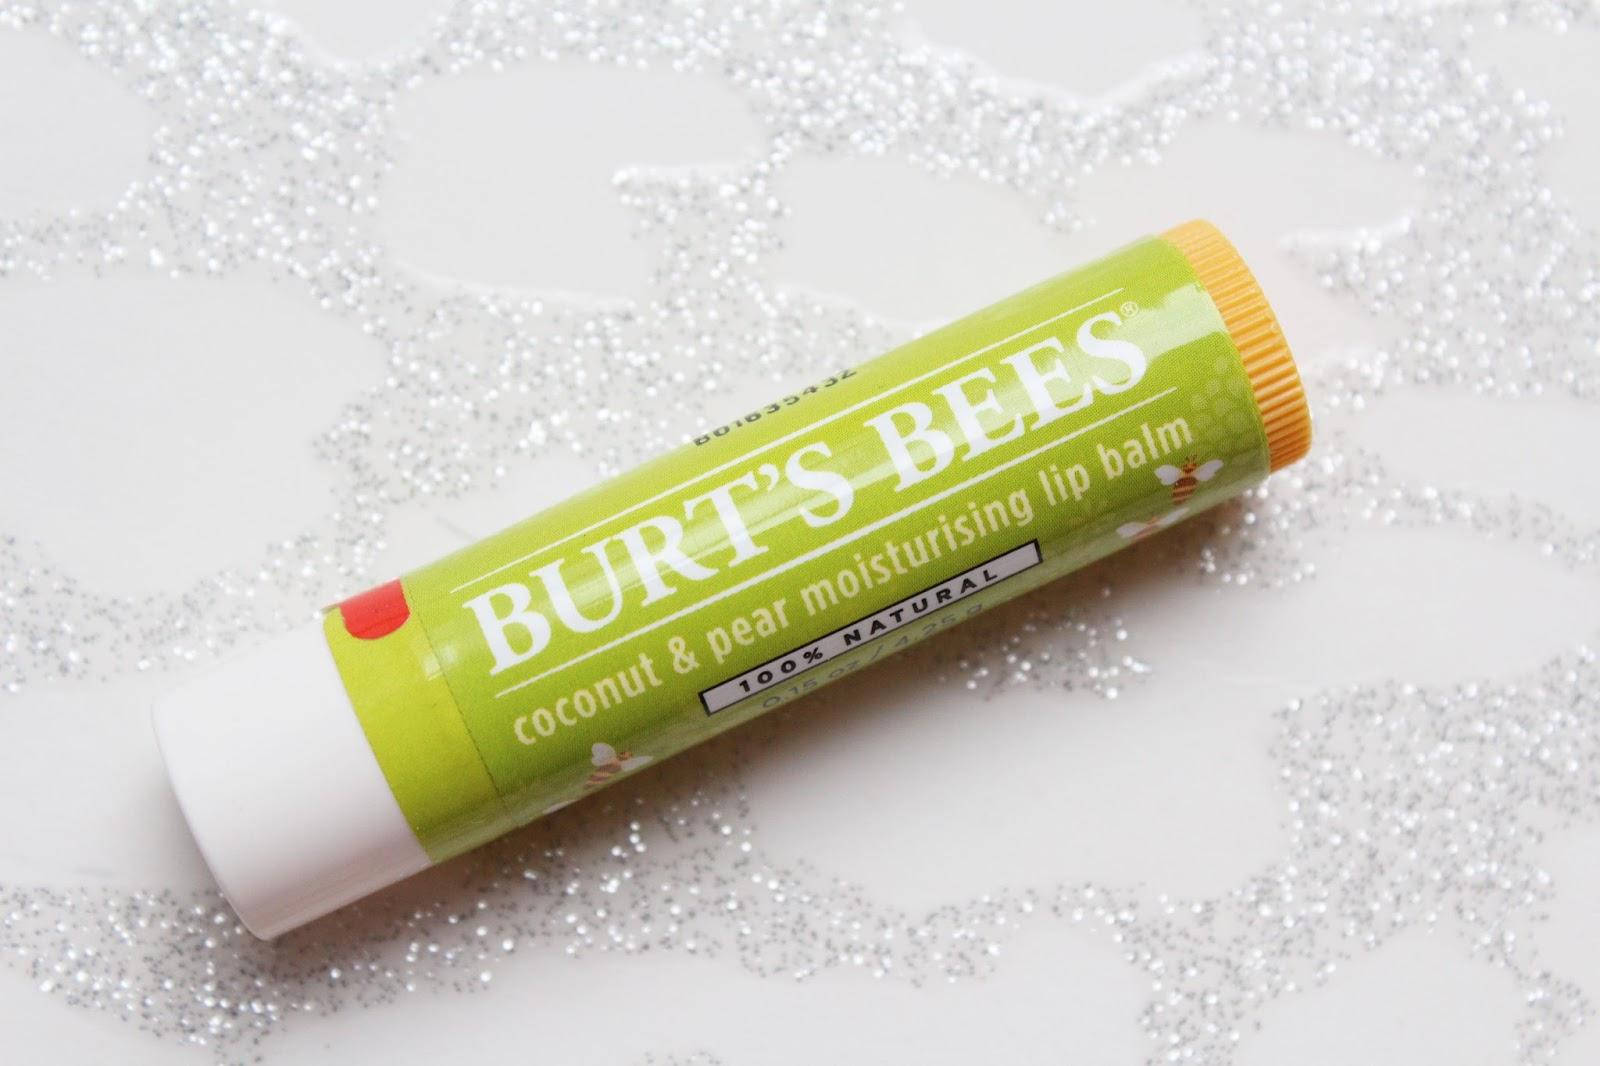 Burt's Bees #BringBacktheBees Lip Balm